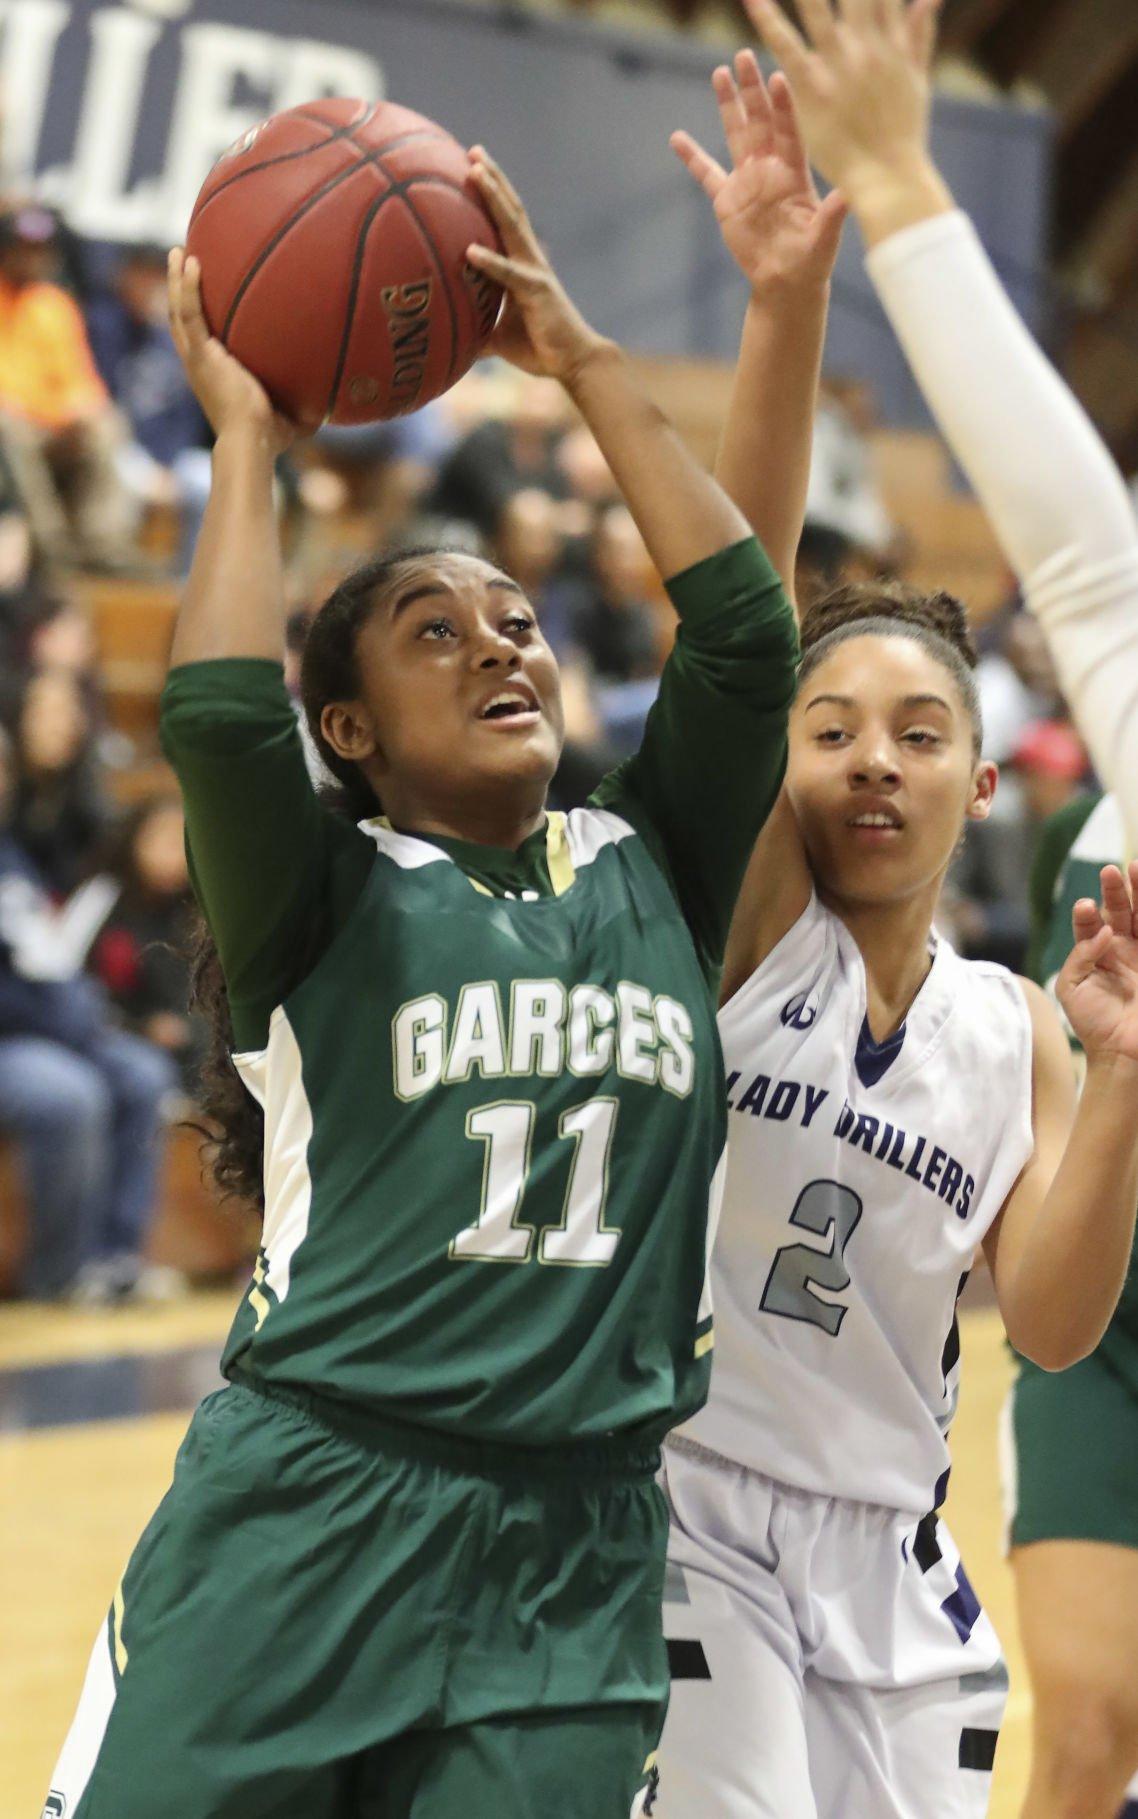 Garces BHS girls basketball